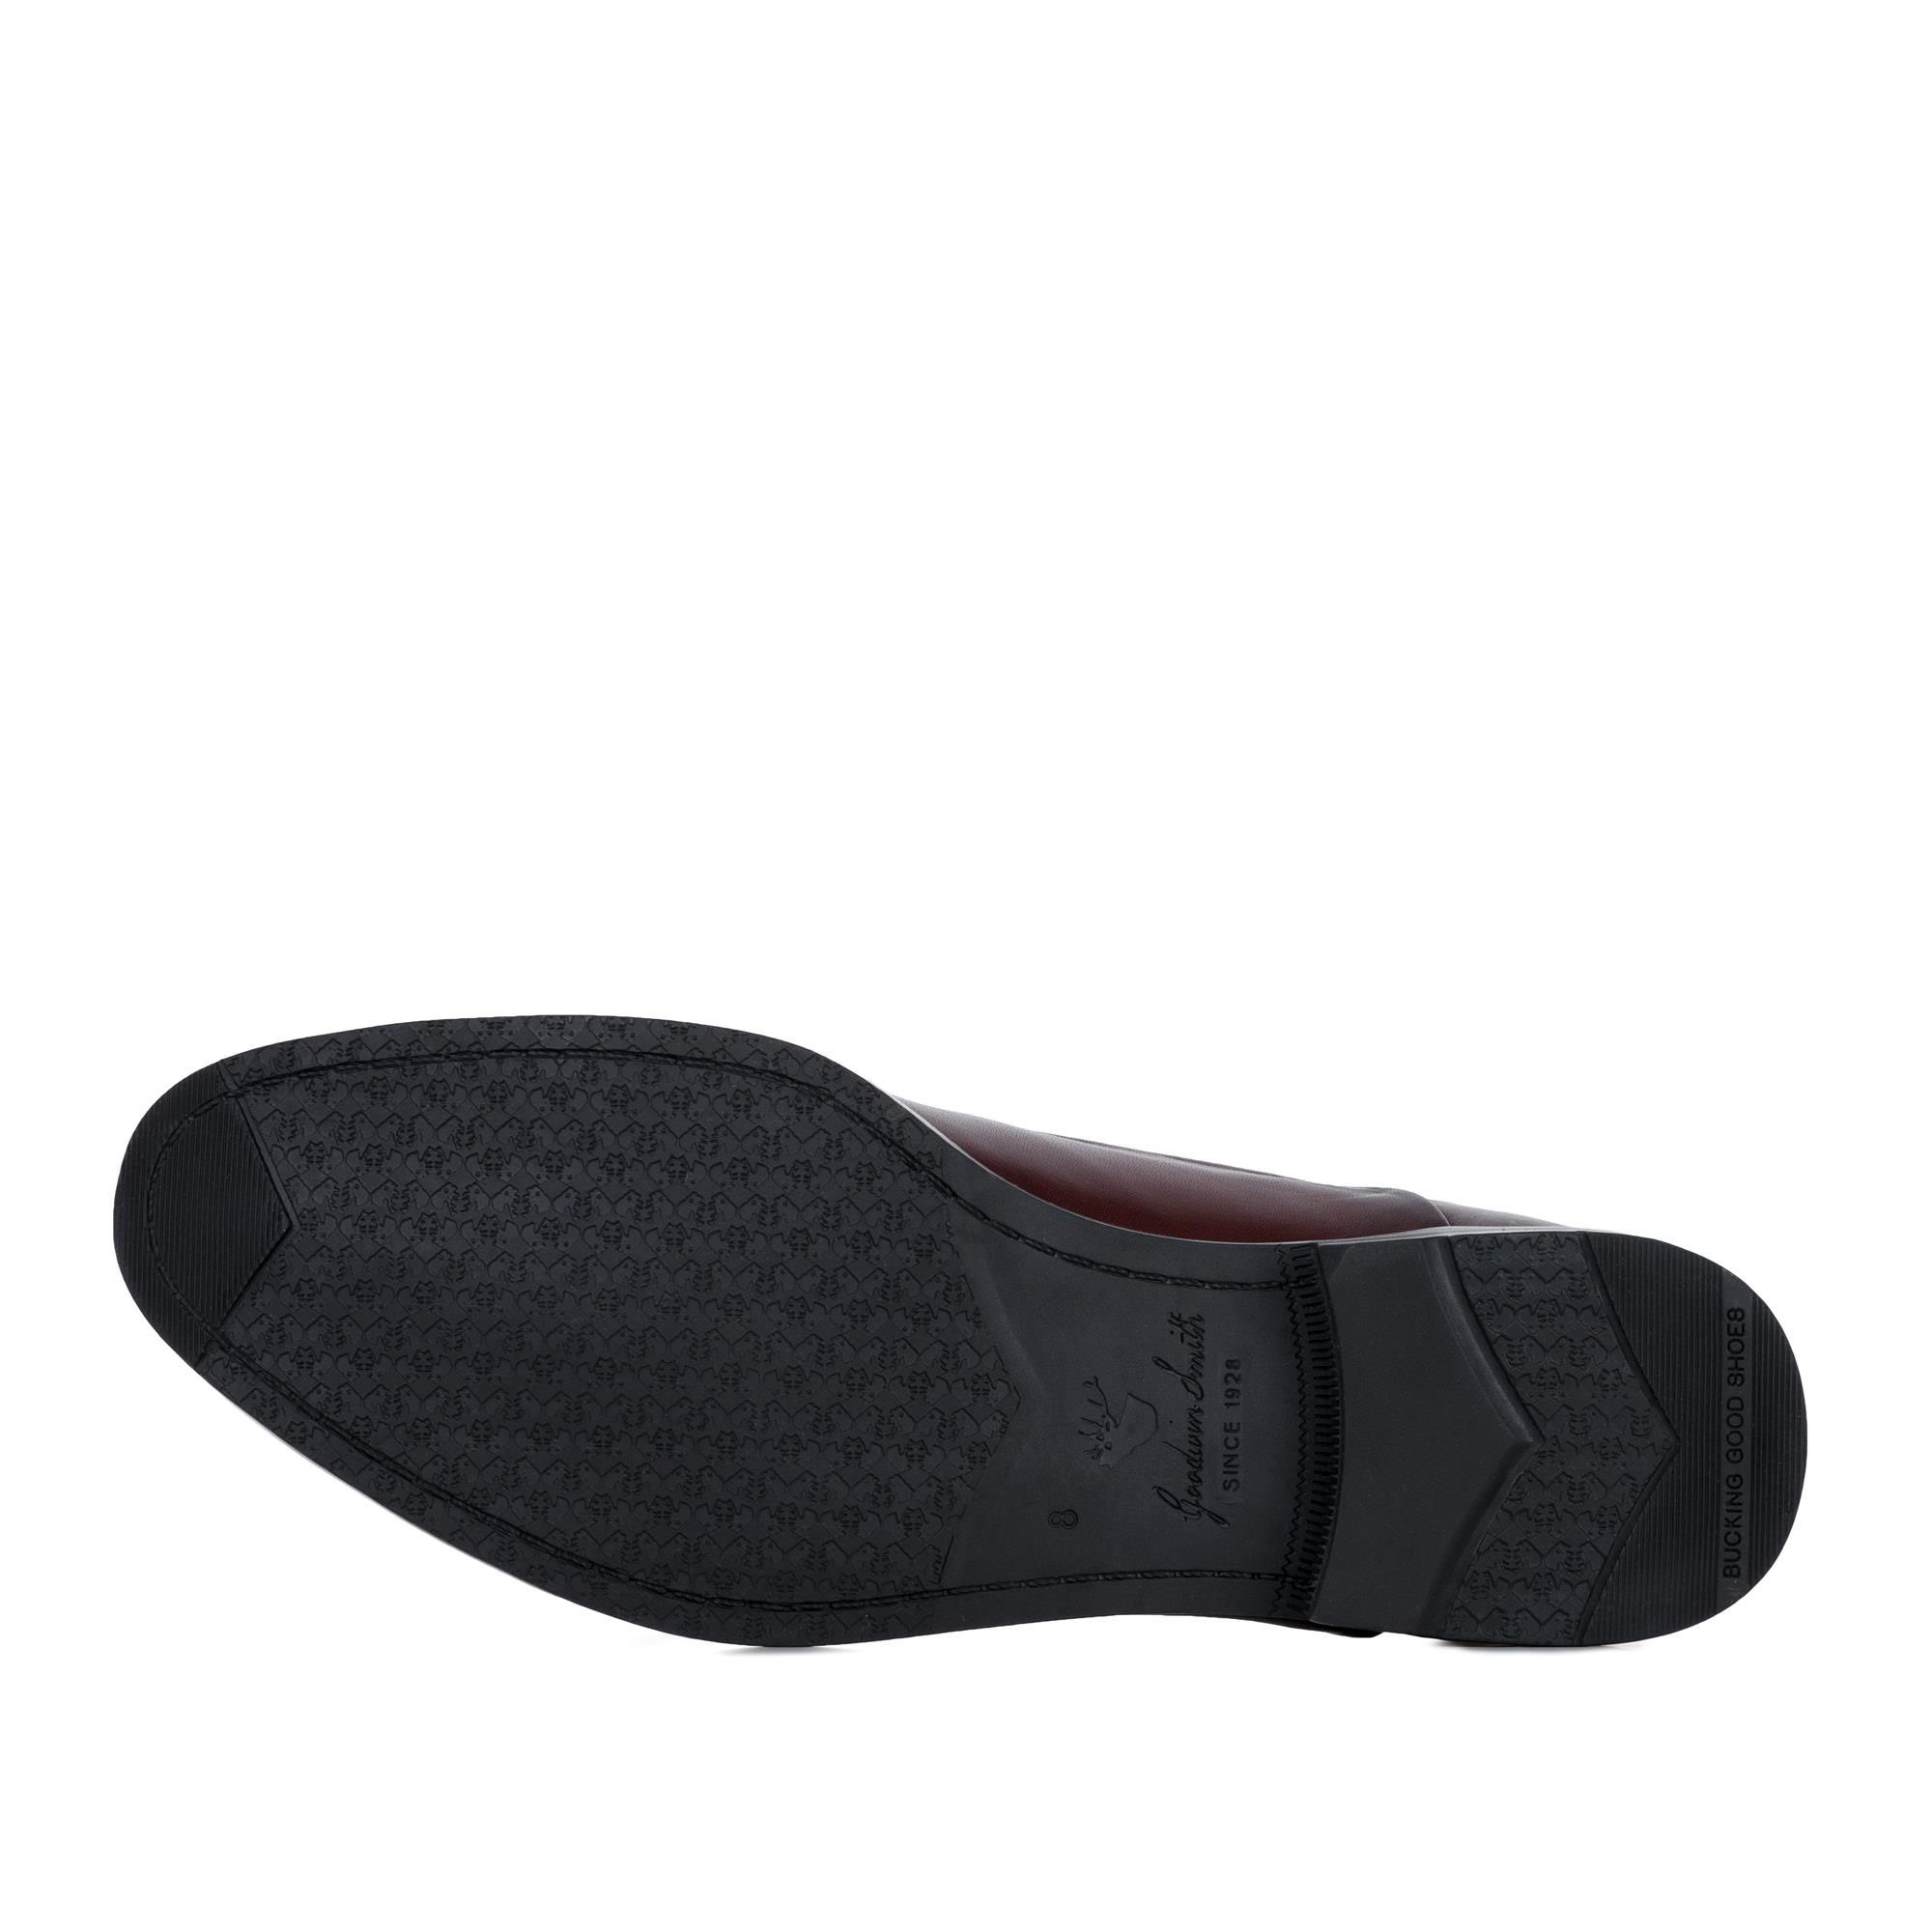 Goodwin Smith Irving Bordo Classic Leather Oxford Shoe